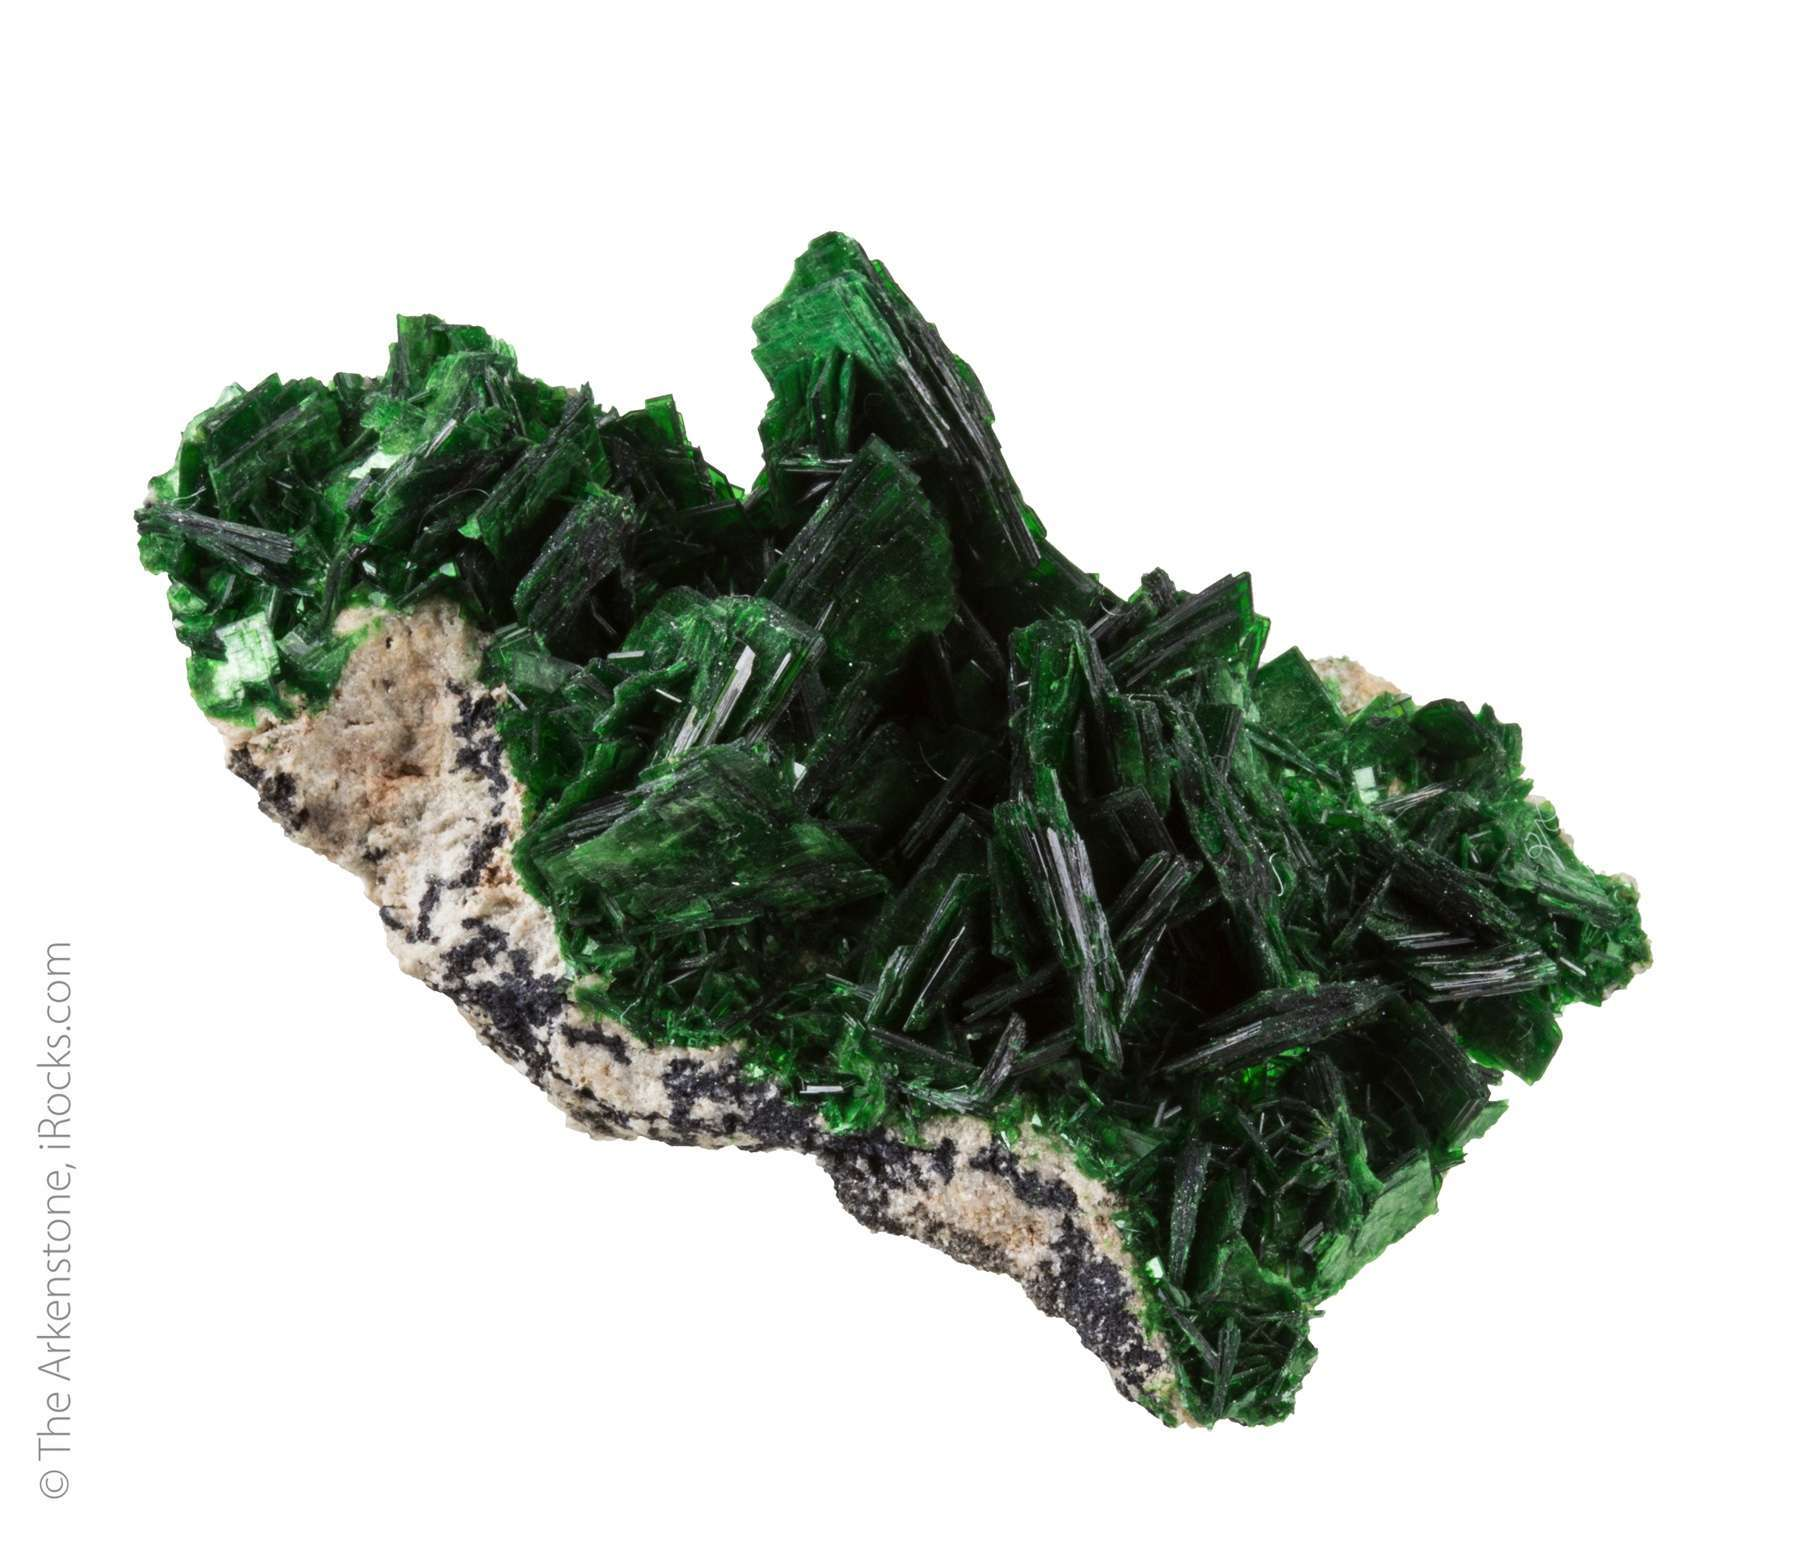 These classics heyday uranium mining famous deposits specimens came